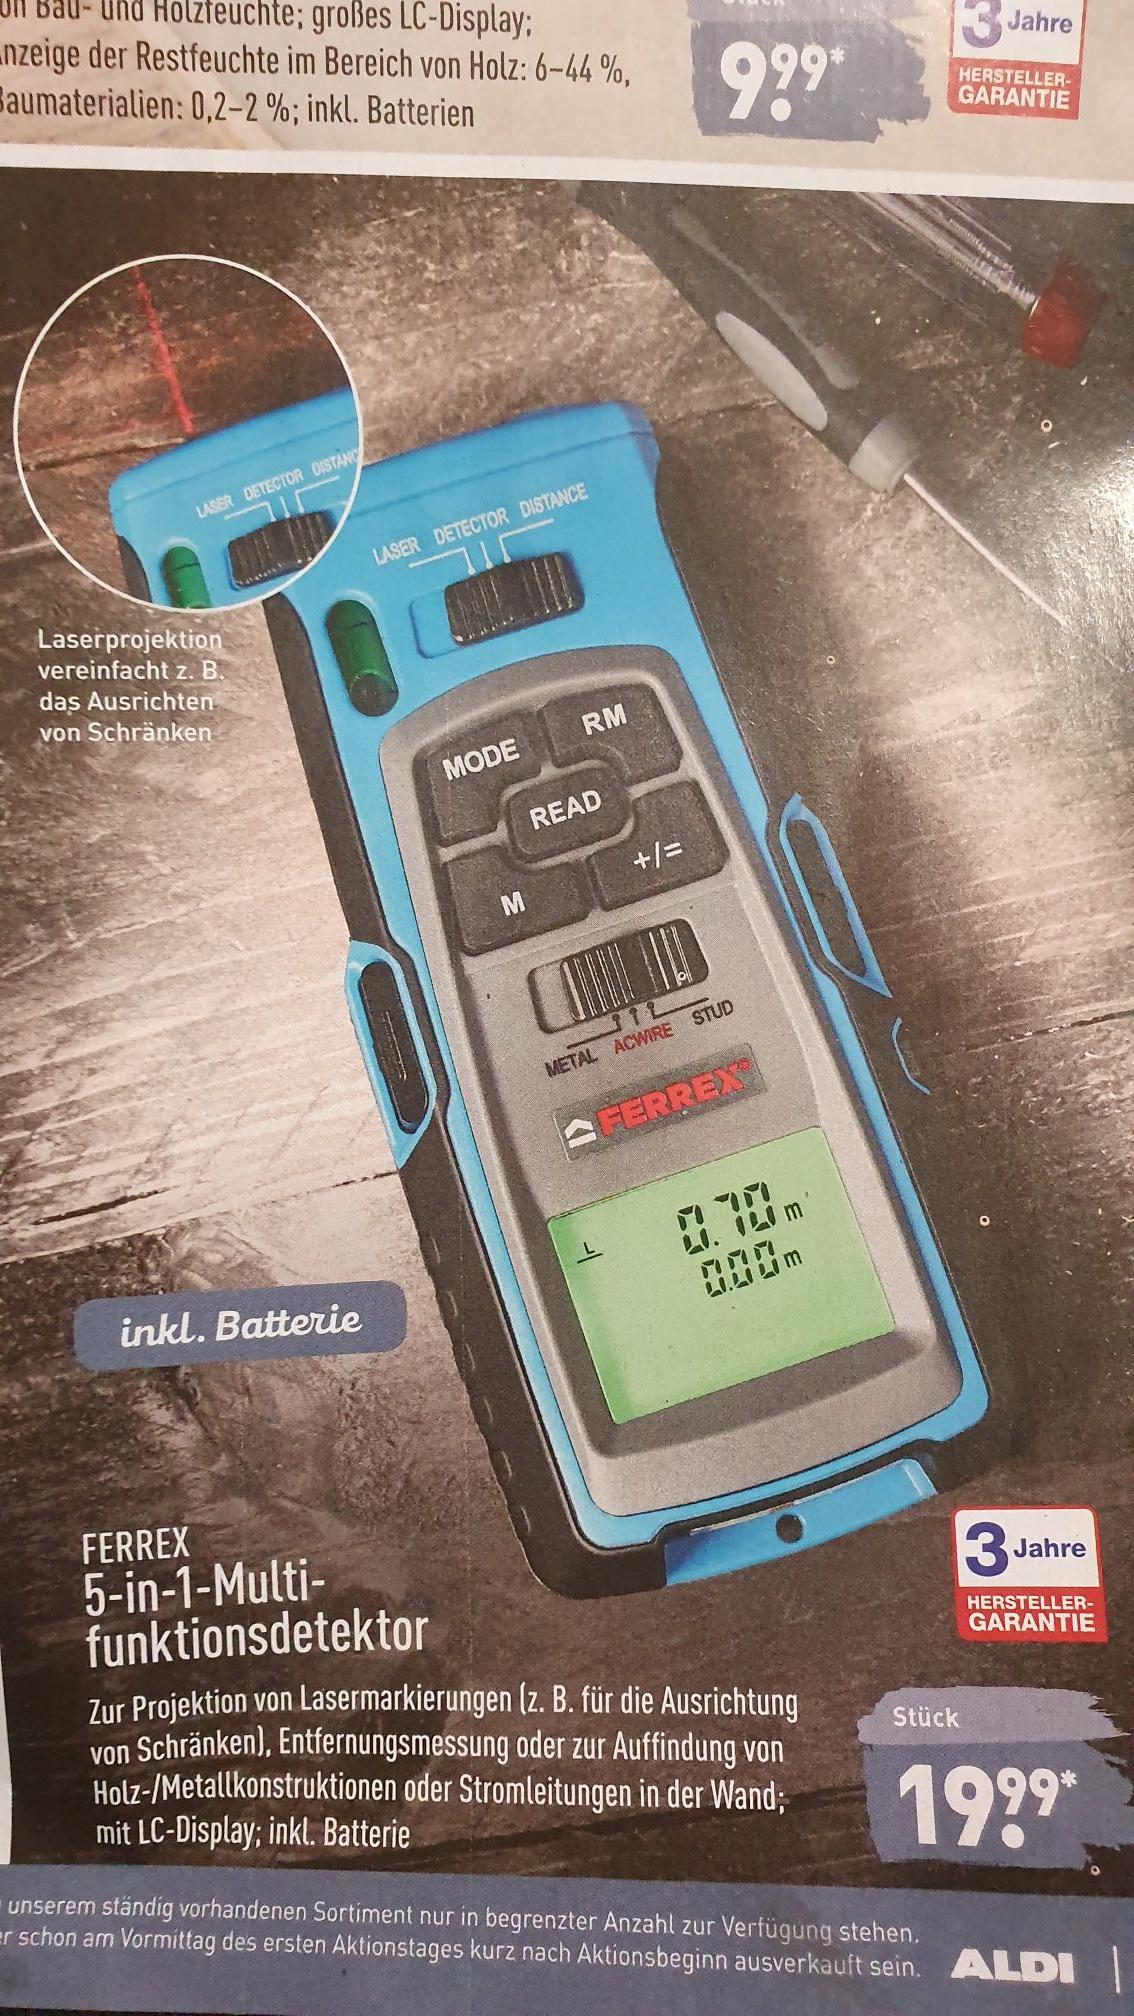 [Aldi] FERREX 5 in 1 Multifunktionsdetektor inkl. Batterie zum super Preis